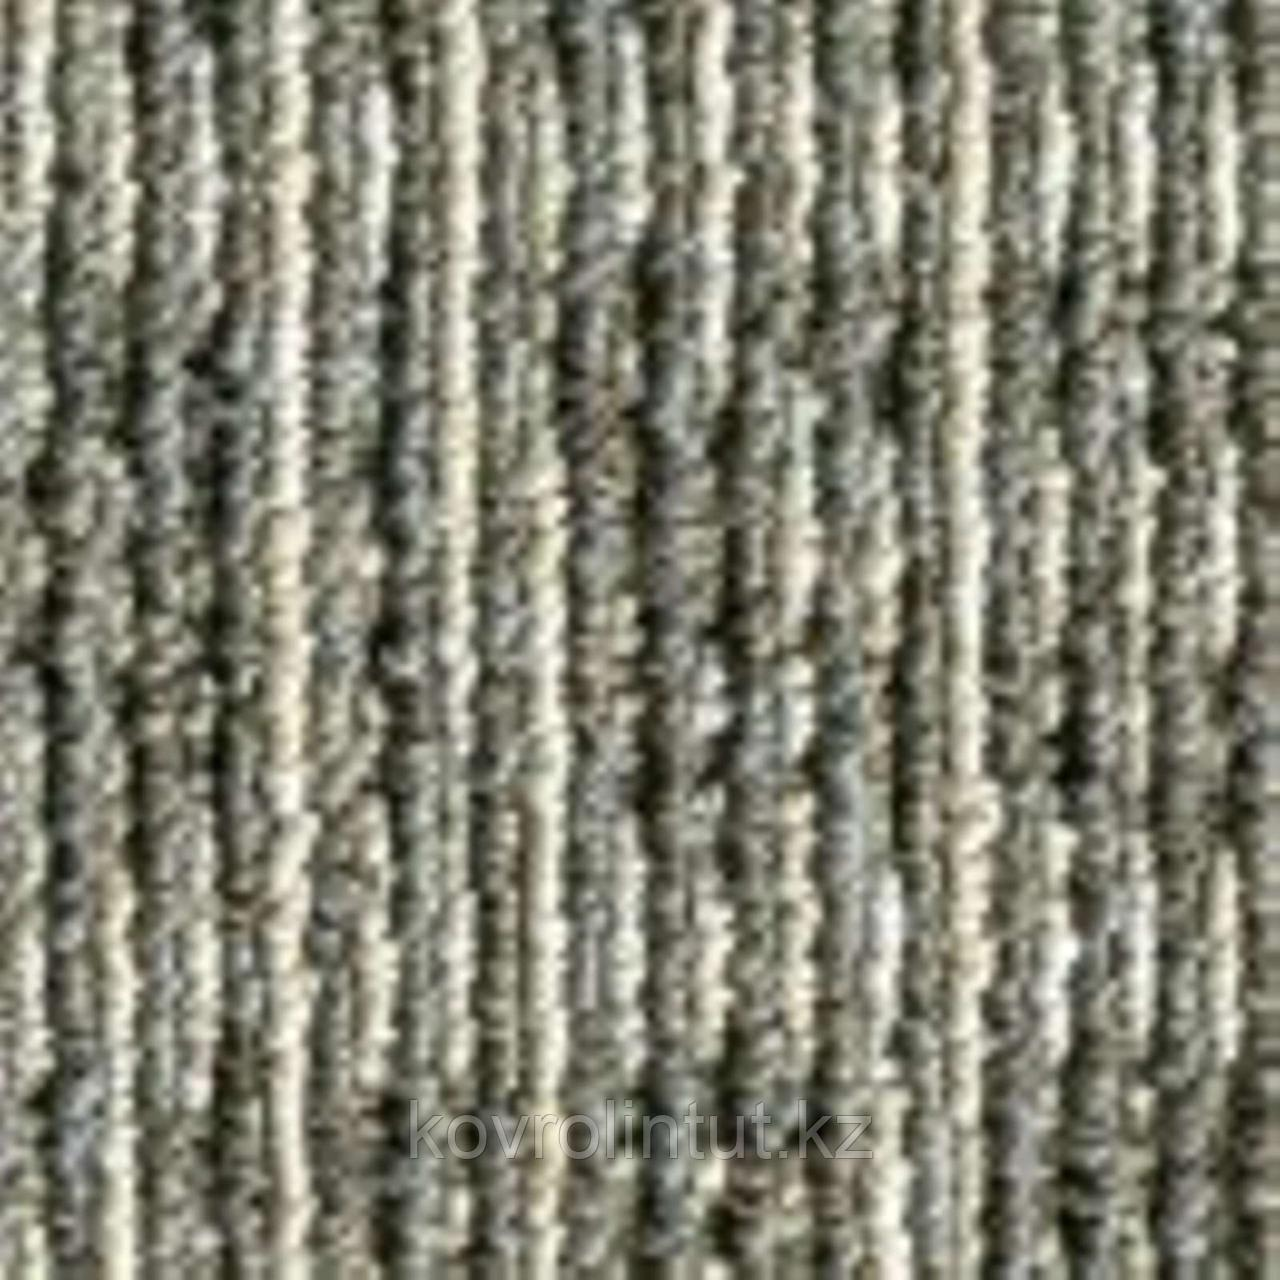 Плитка ковровая Сondor Graphic Imagination 70, 50х50, 5м2/уп